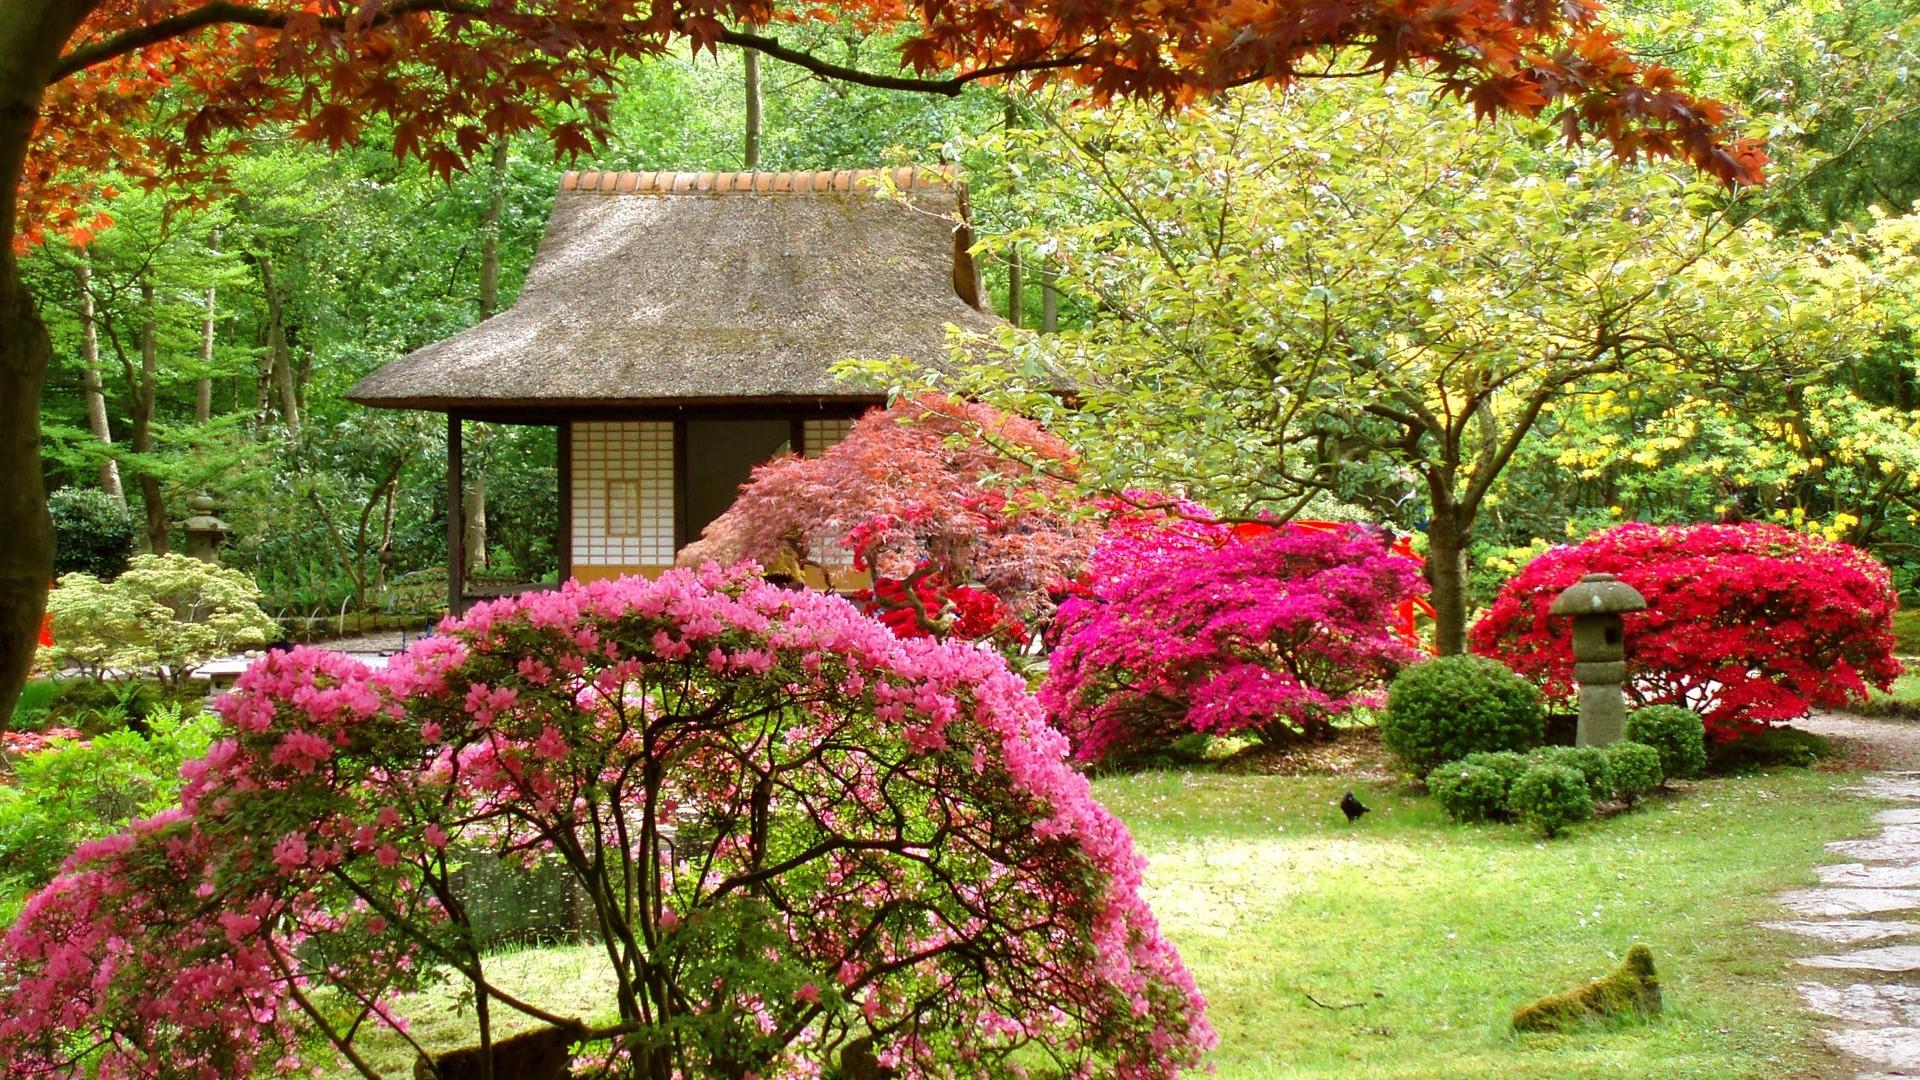 Spring gardens apartments Windows 8 Theme All for Windows 10 1920x1080